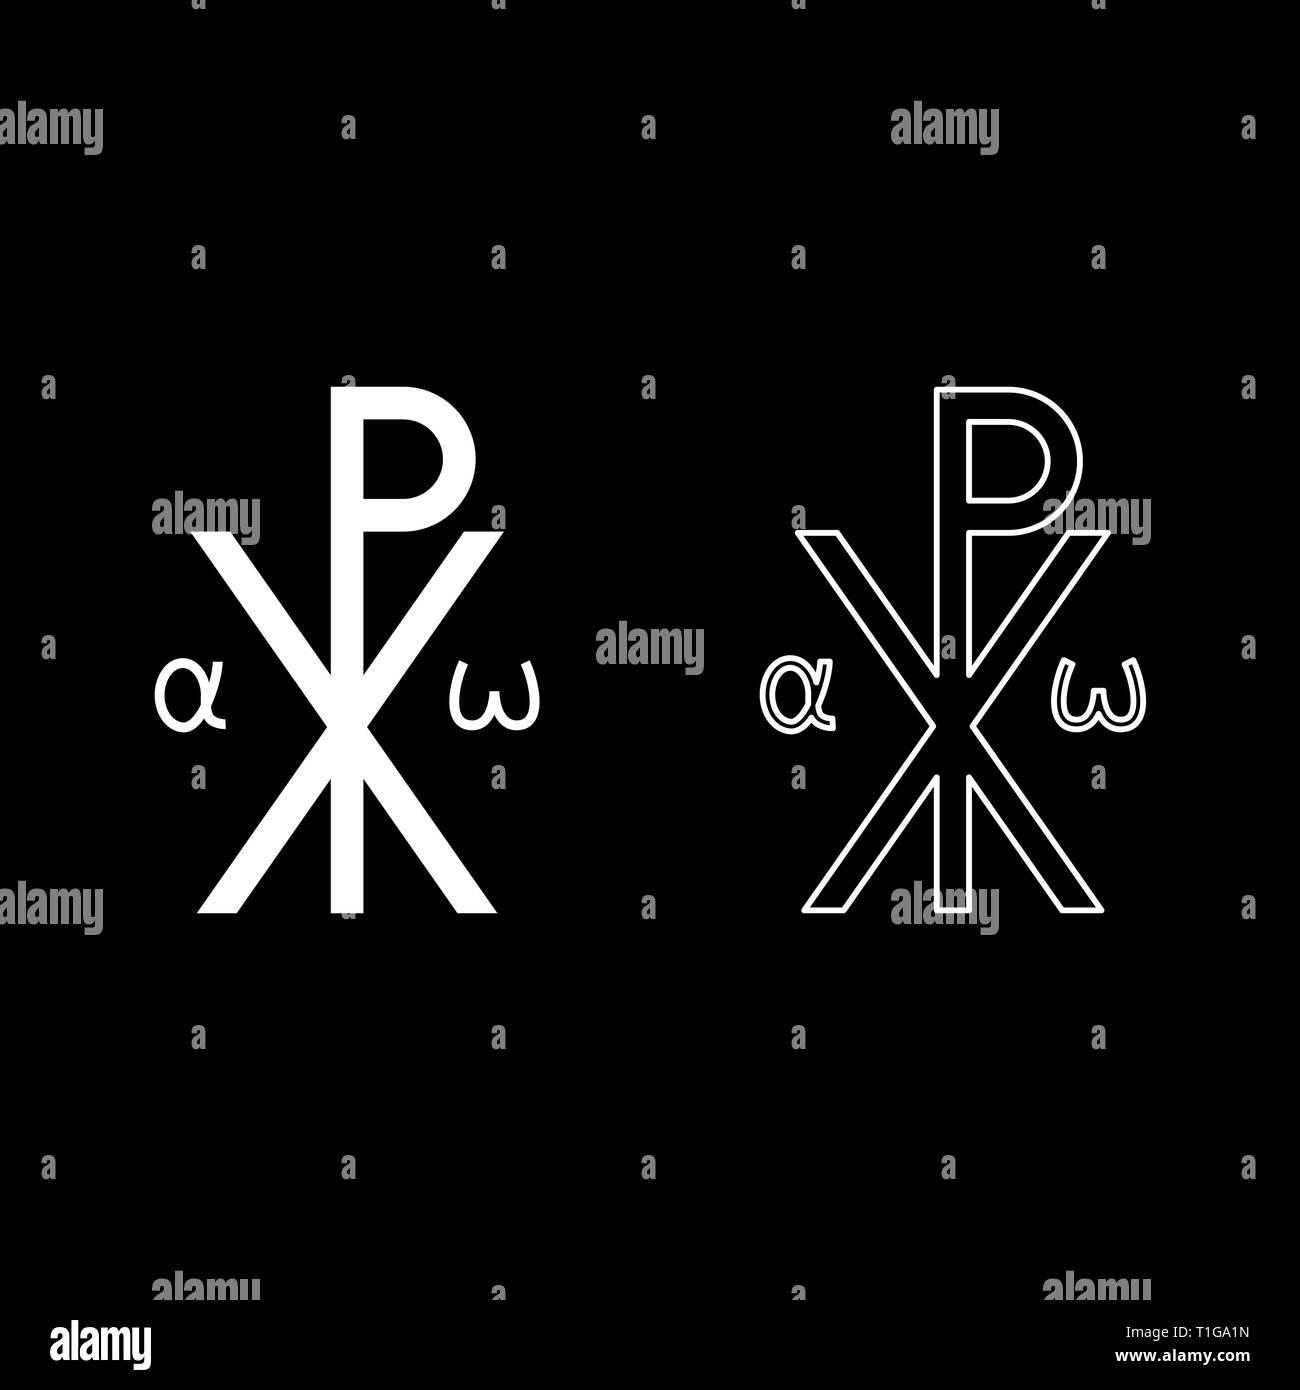 Crismon symbol Cross monogram Xi Hi Ro Konstantin Symbol Saint Pastor sign Religious cross Alfa Omega icon set white color vector illustration flat - Stock Vector